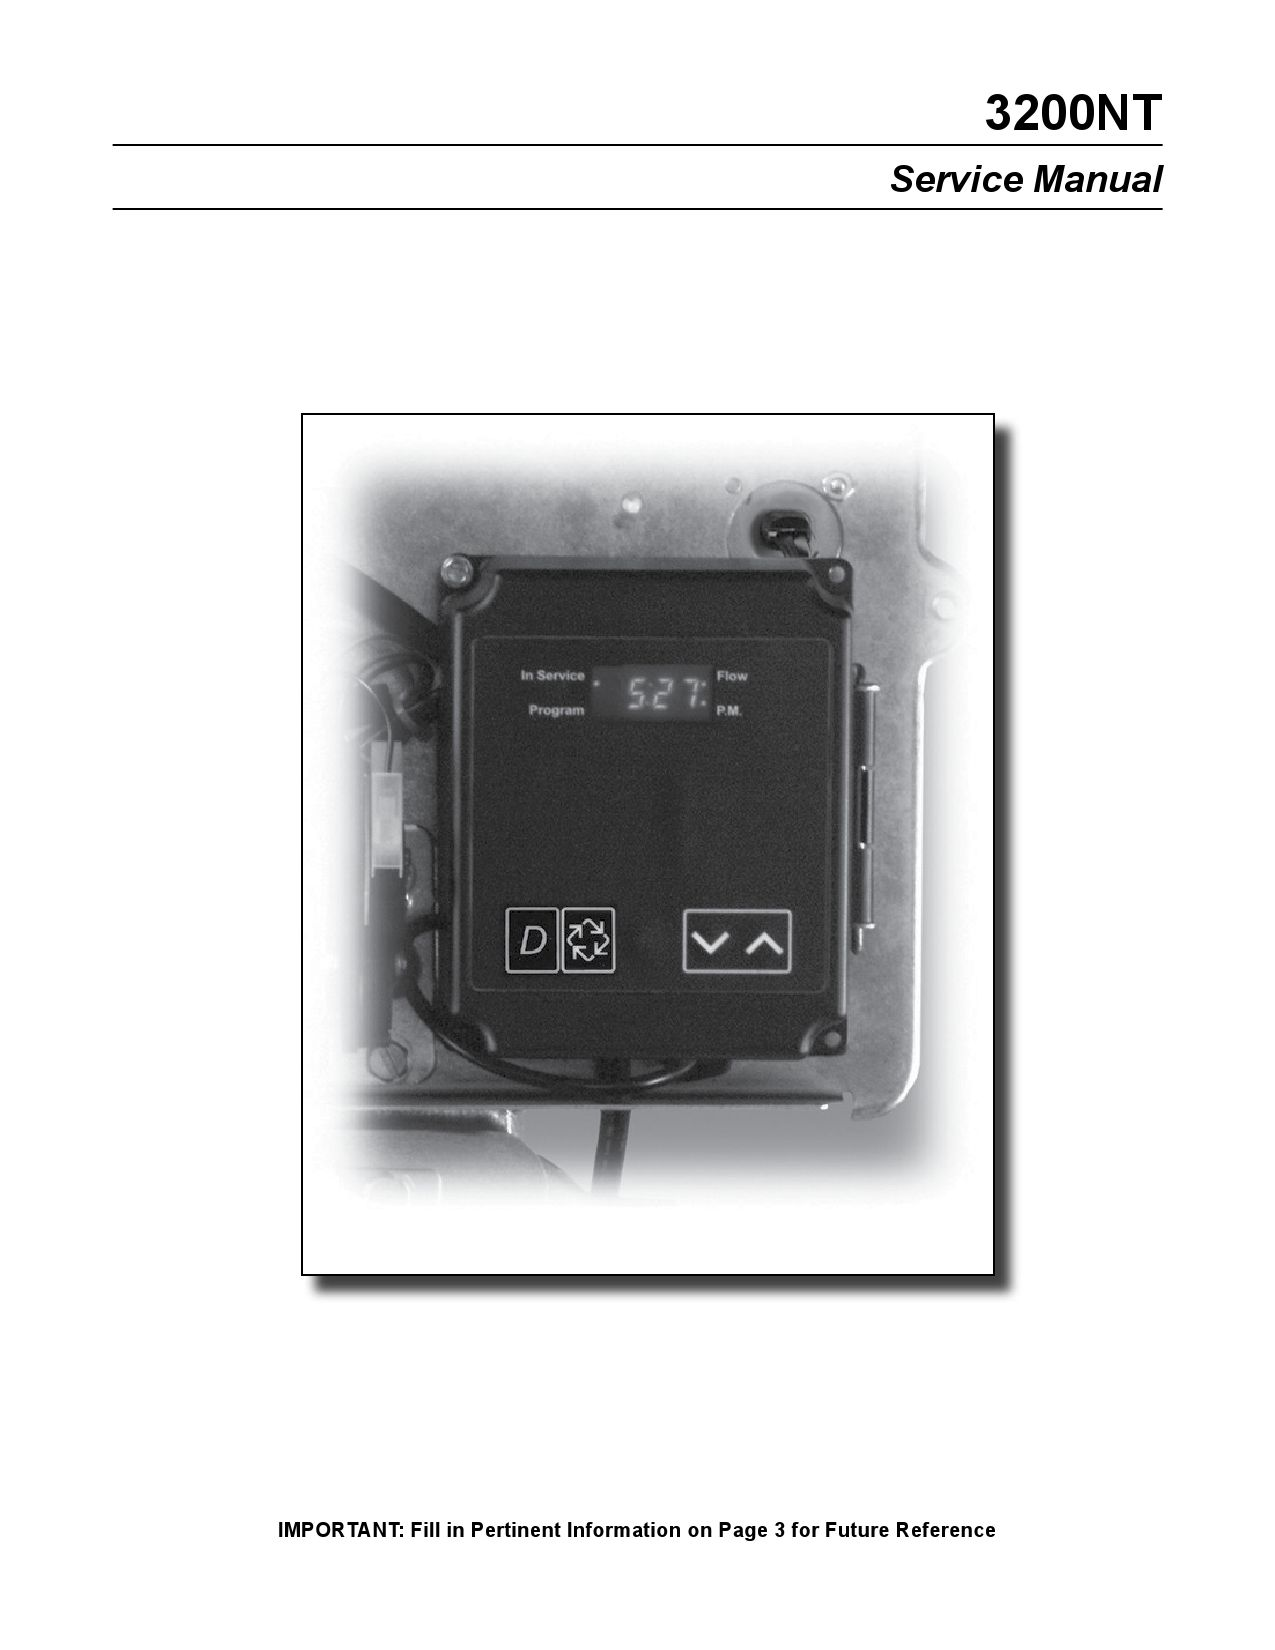 Fleck 3200nt Timer Manual De Servicio By Puradom Srl